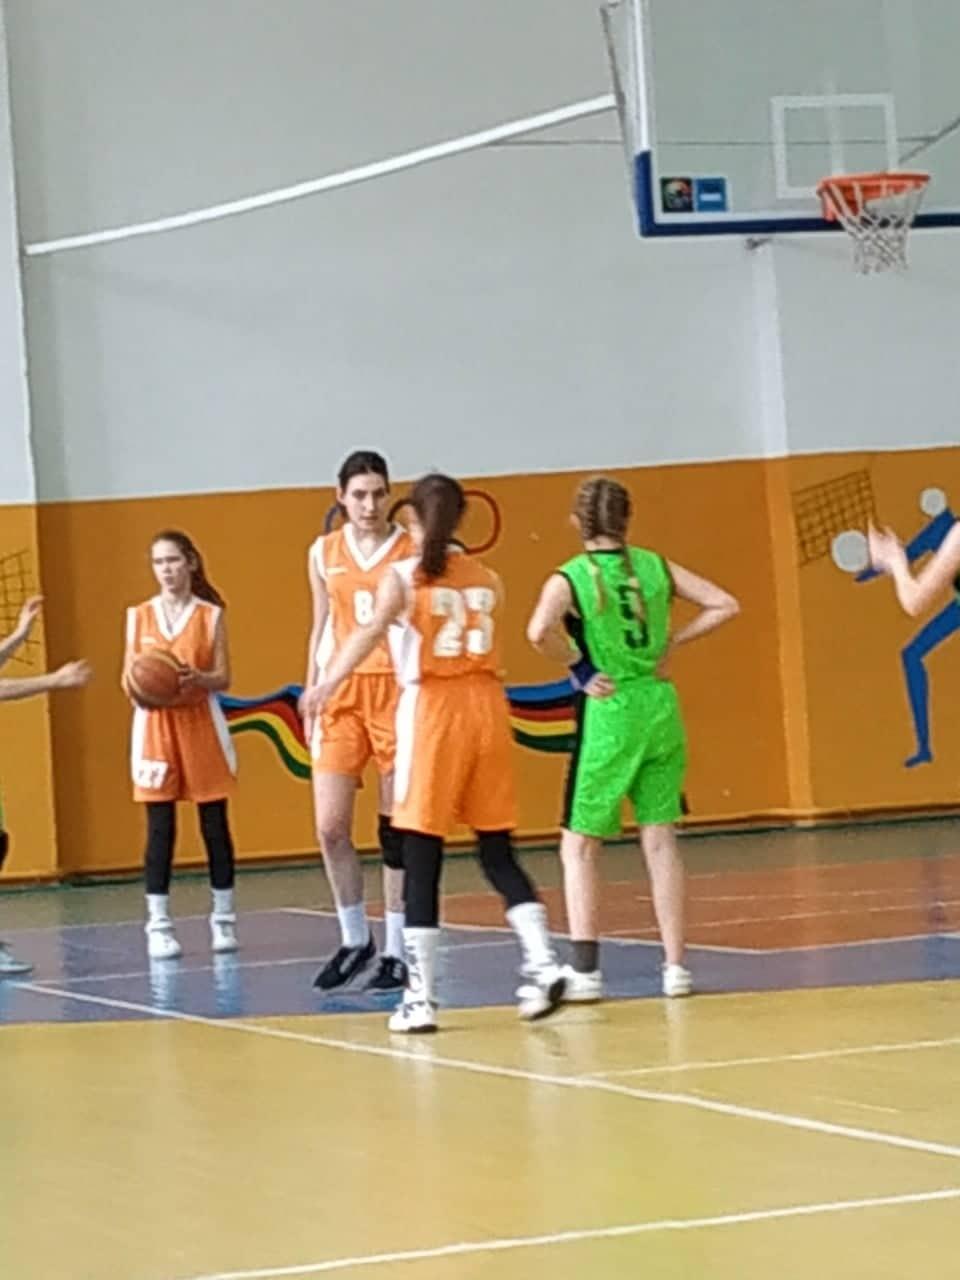 Чемпионат Р.Молдова по баскетболу (U-18 девушки), 25-28 февраля 2019 года